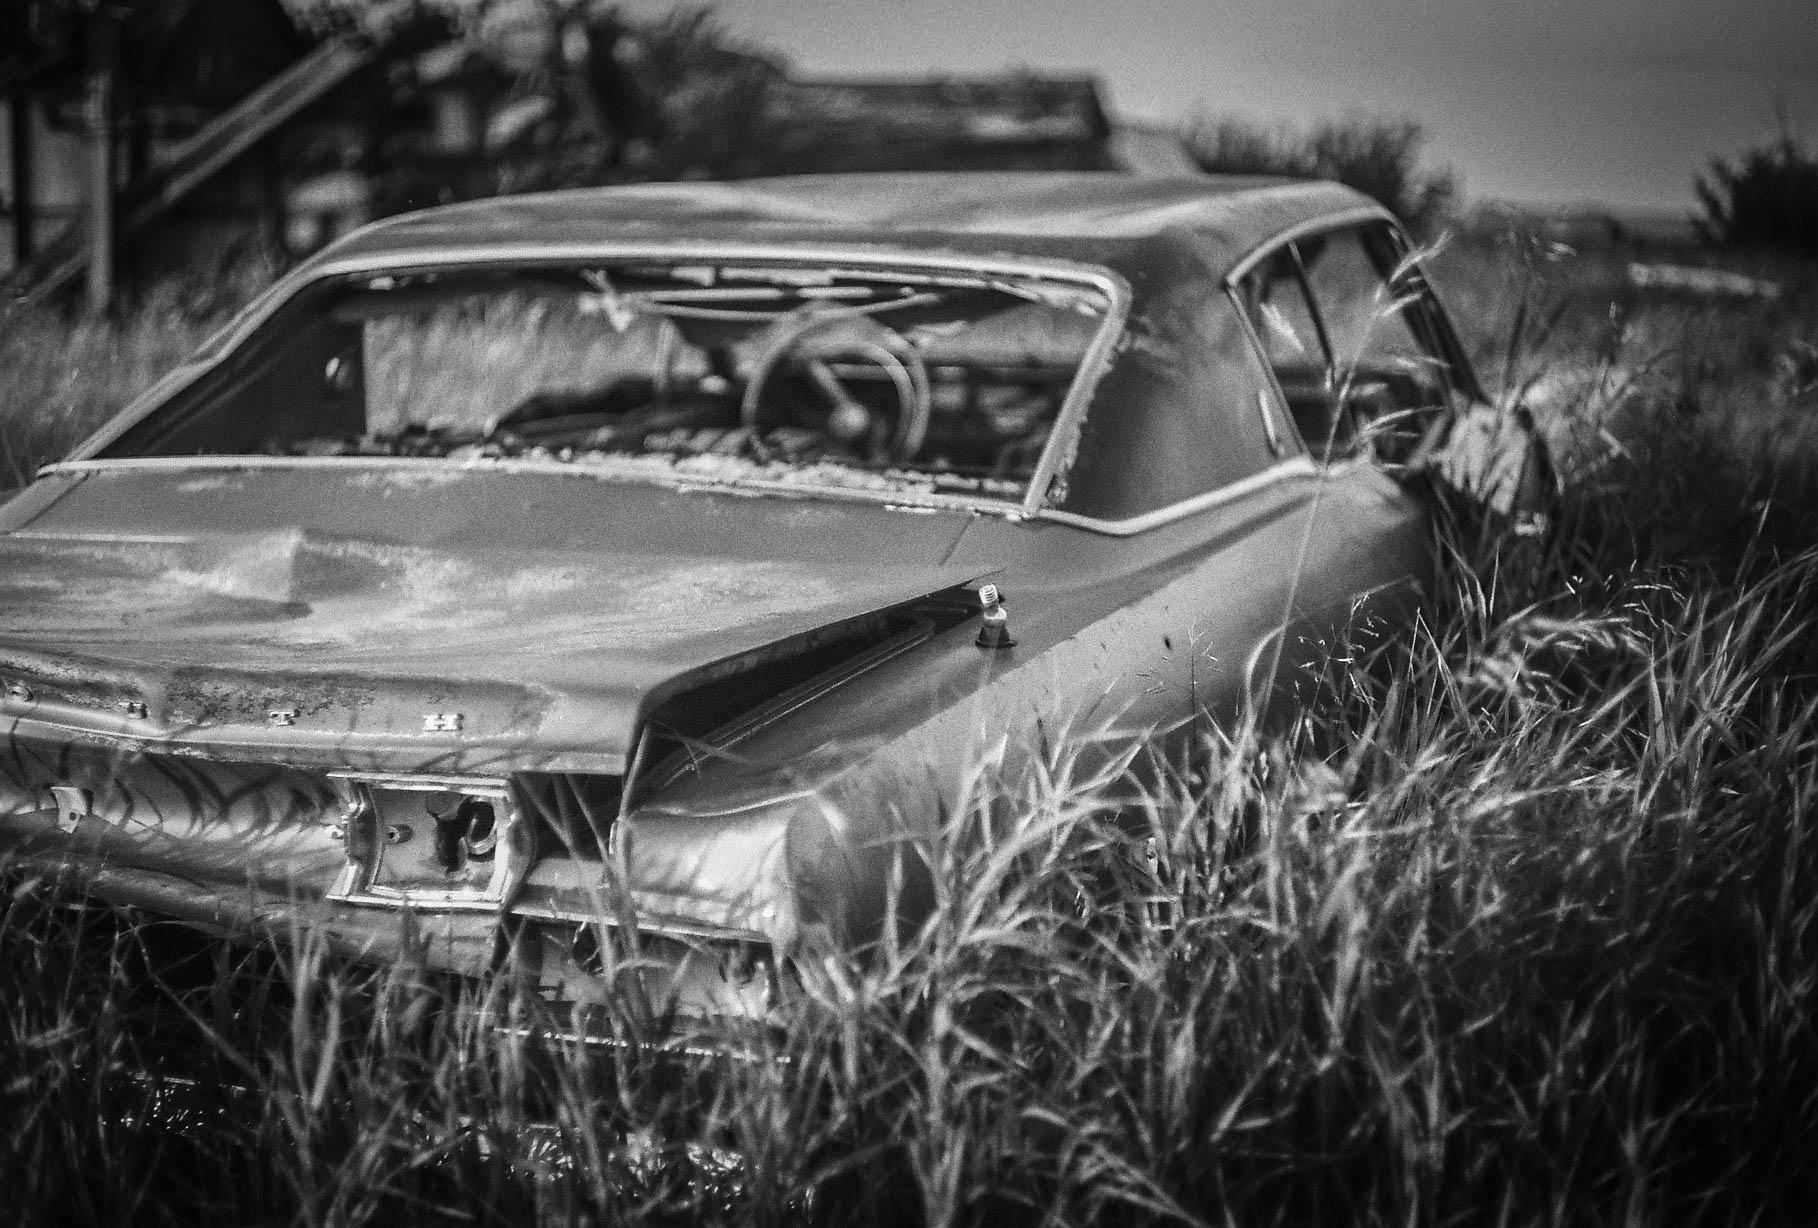 Plymouth Fury Bulwark, Alberta Leica M3, Canon 50mm F1.4 Ilford Pan F Plus 50 film 7.16